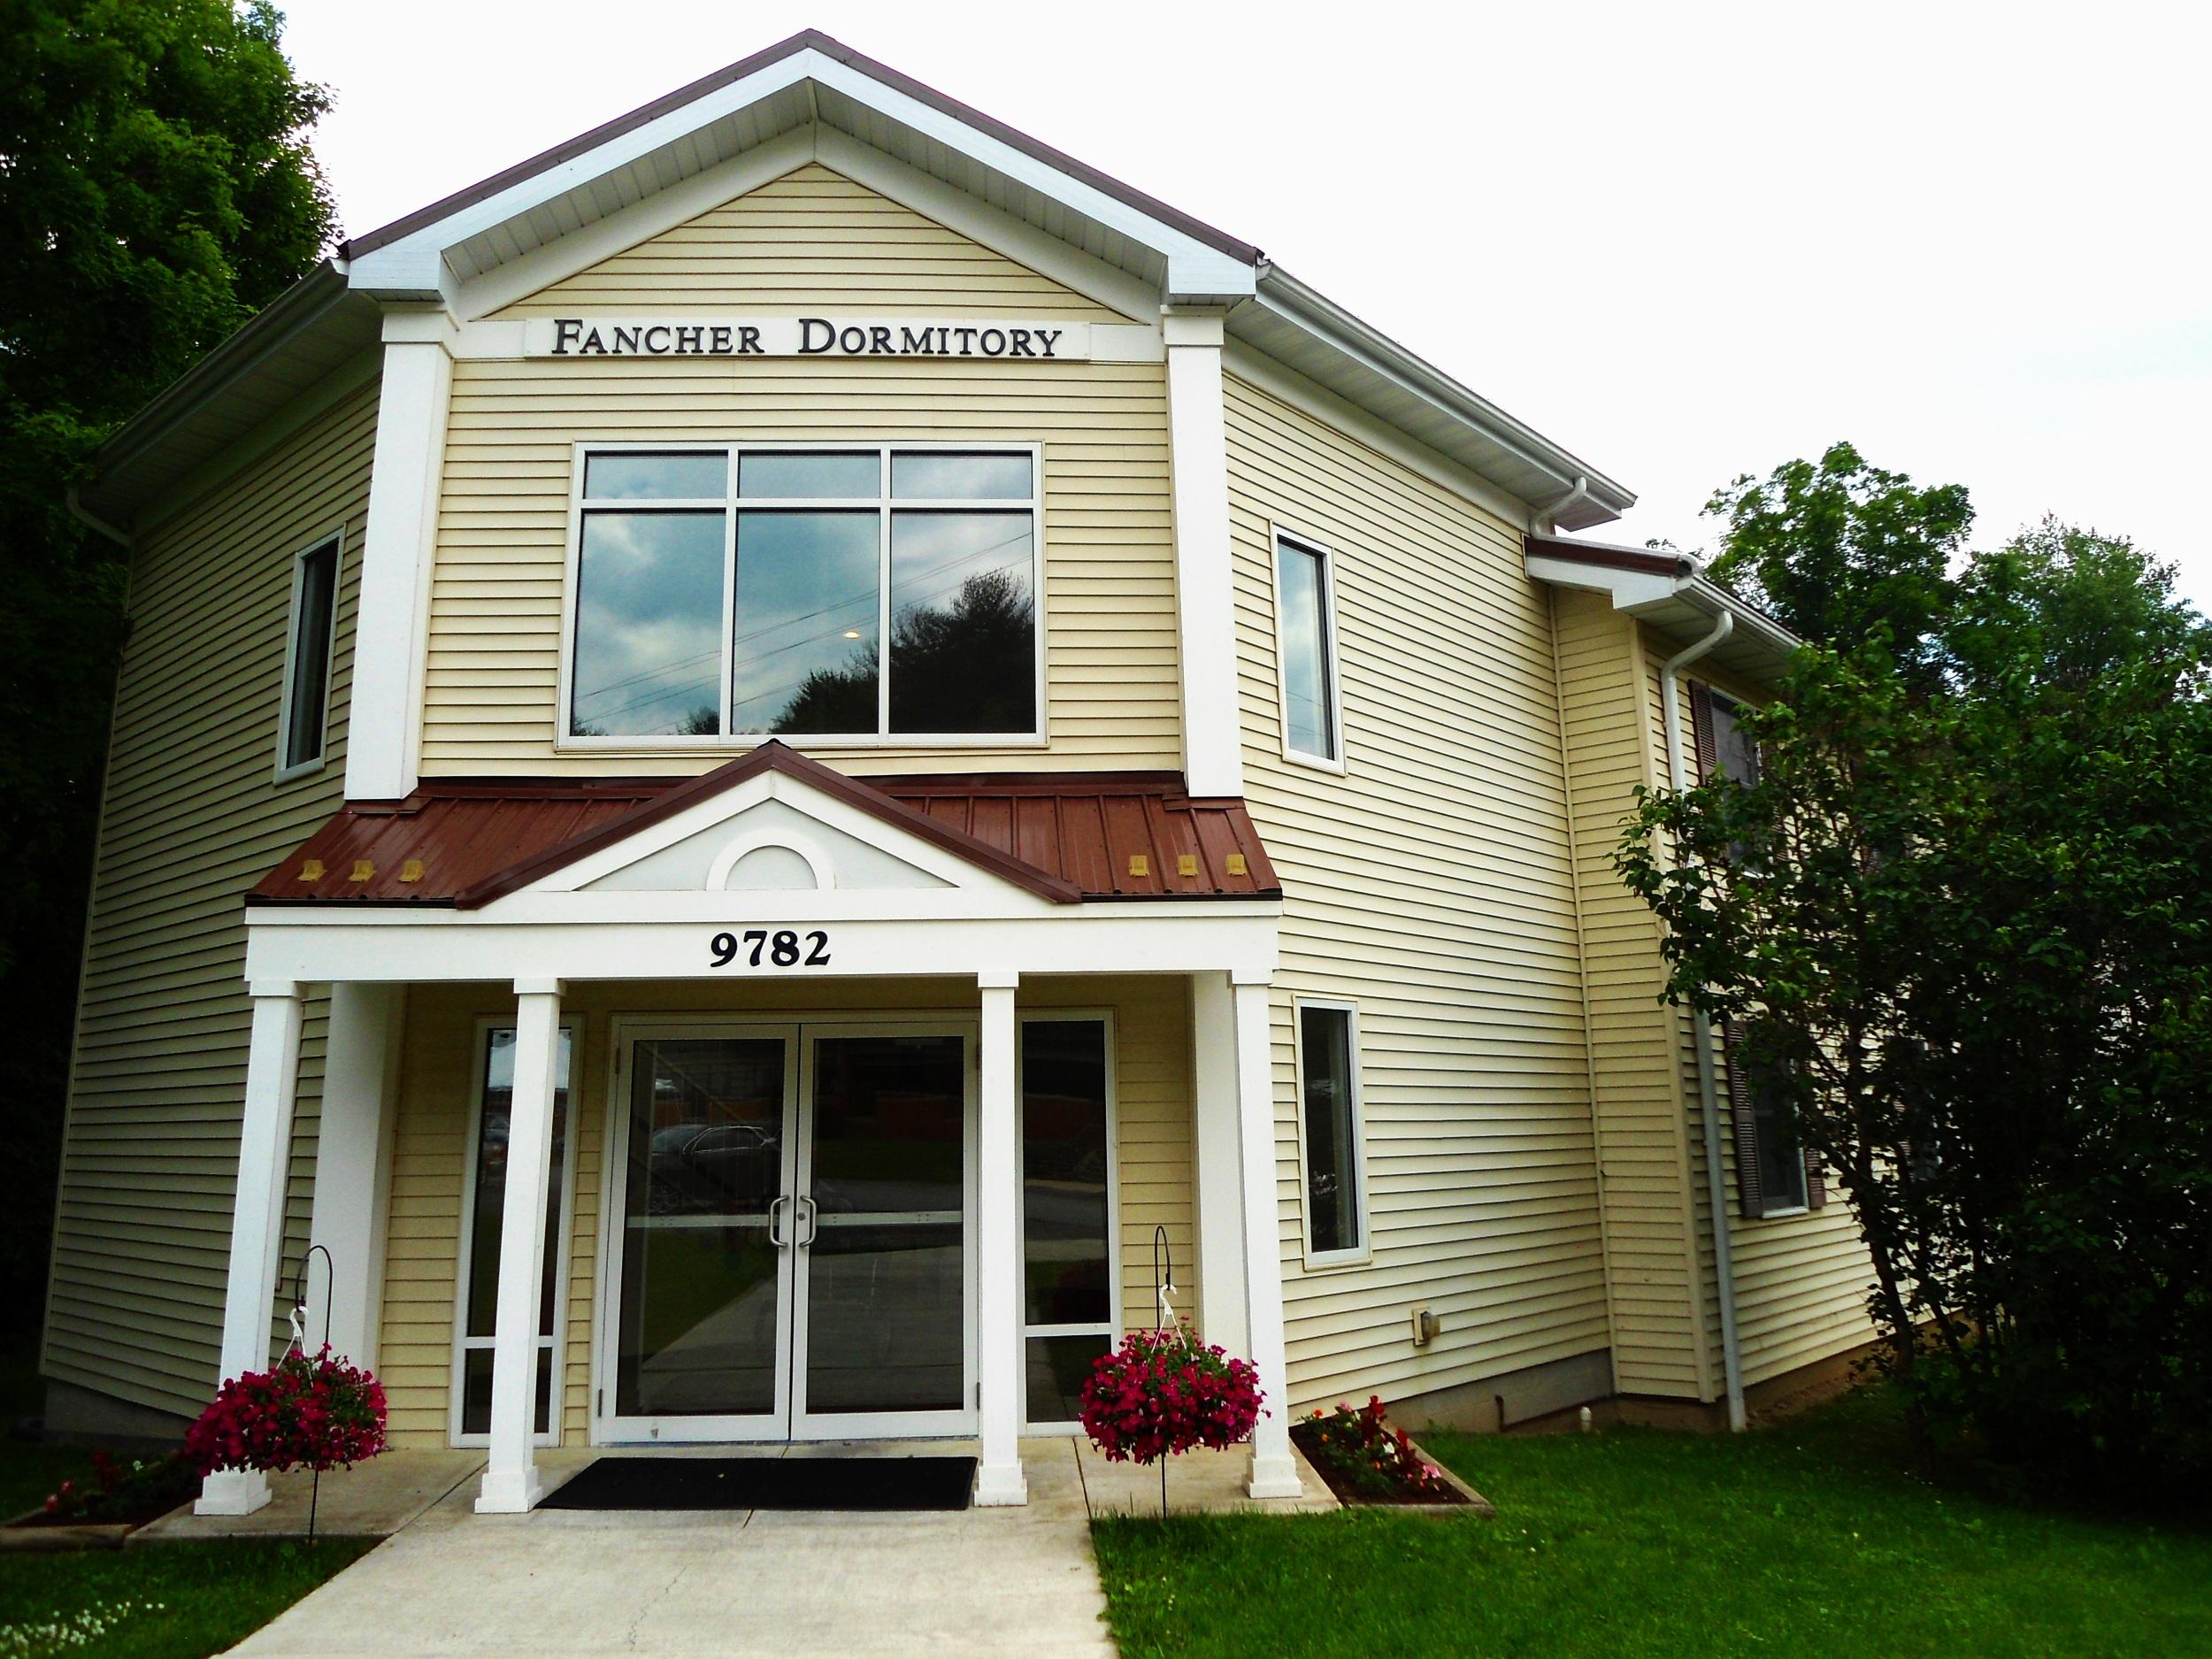 Fancher Dormitory